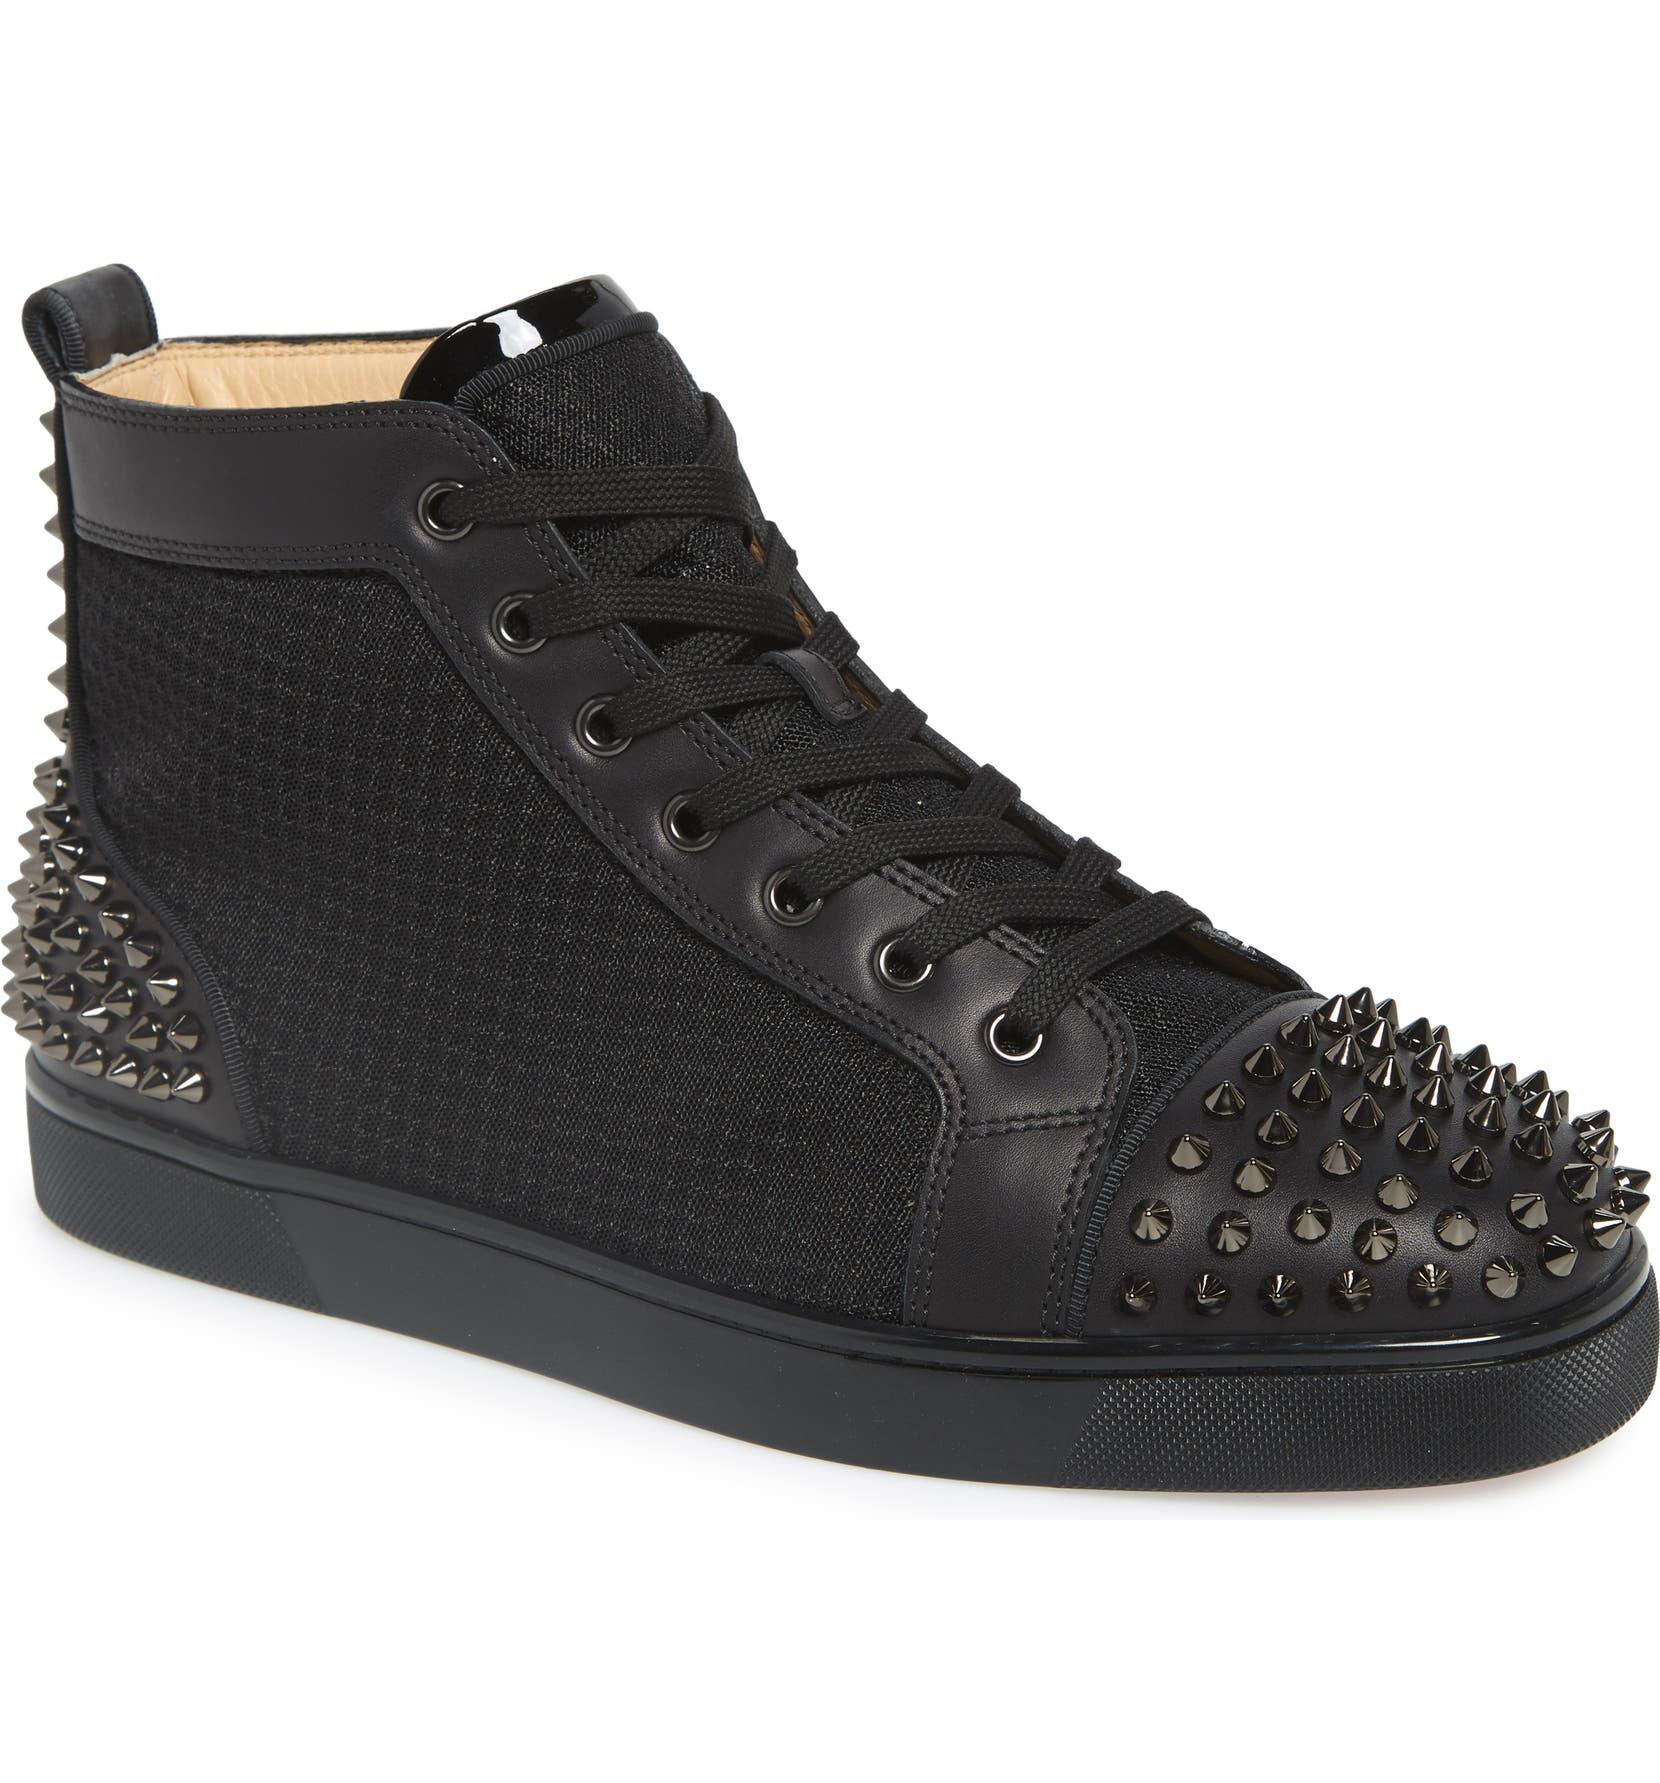 super popular 58f49 6f278 Christian Louboutin AC Lou Spikes 2 High Top Sneaker (Men ...